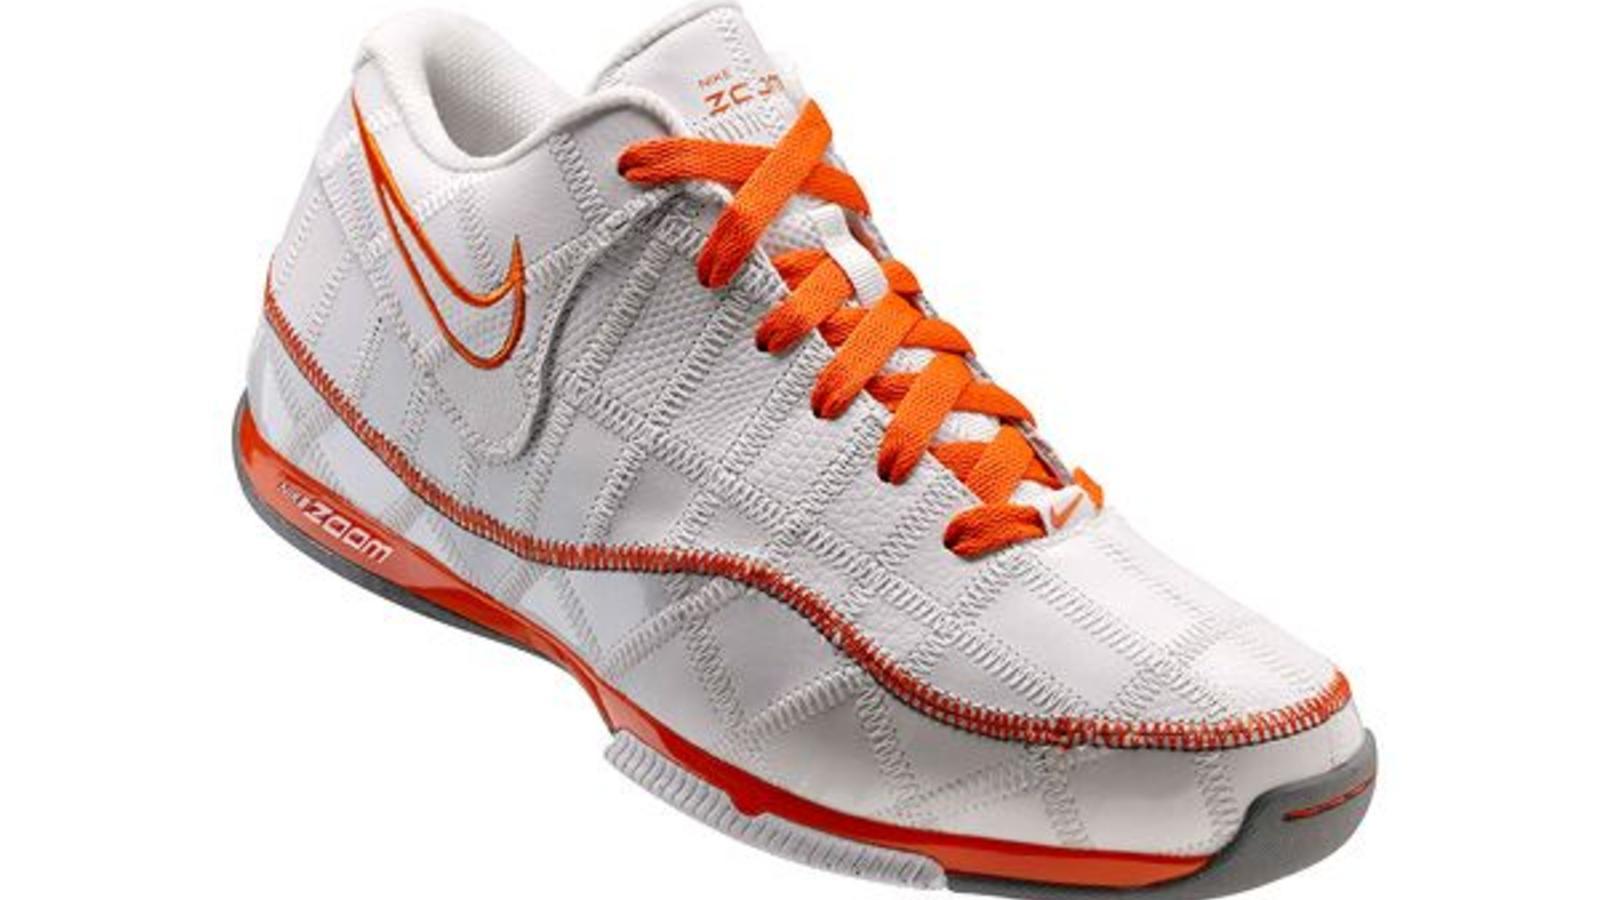 88ca3e437223 Steve Nash and Nike Turn Garbage Into